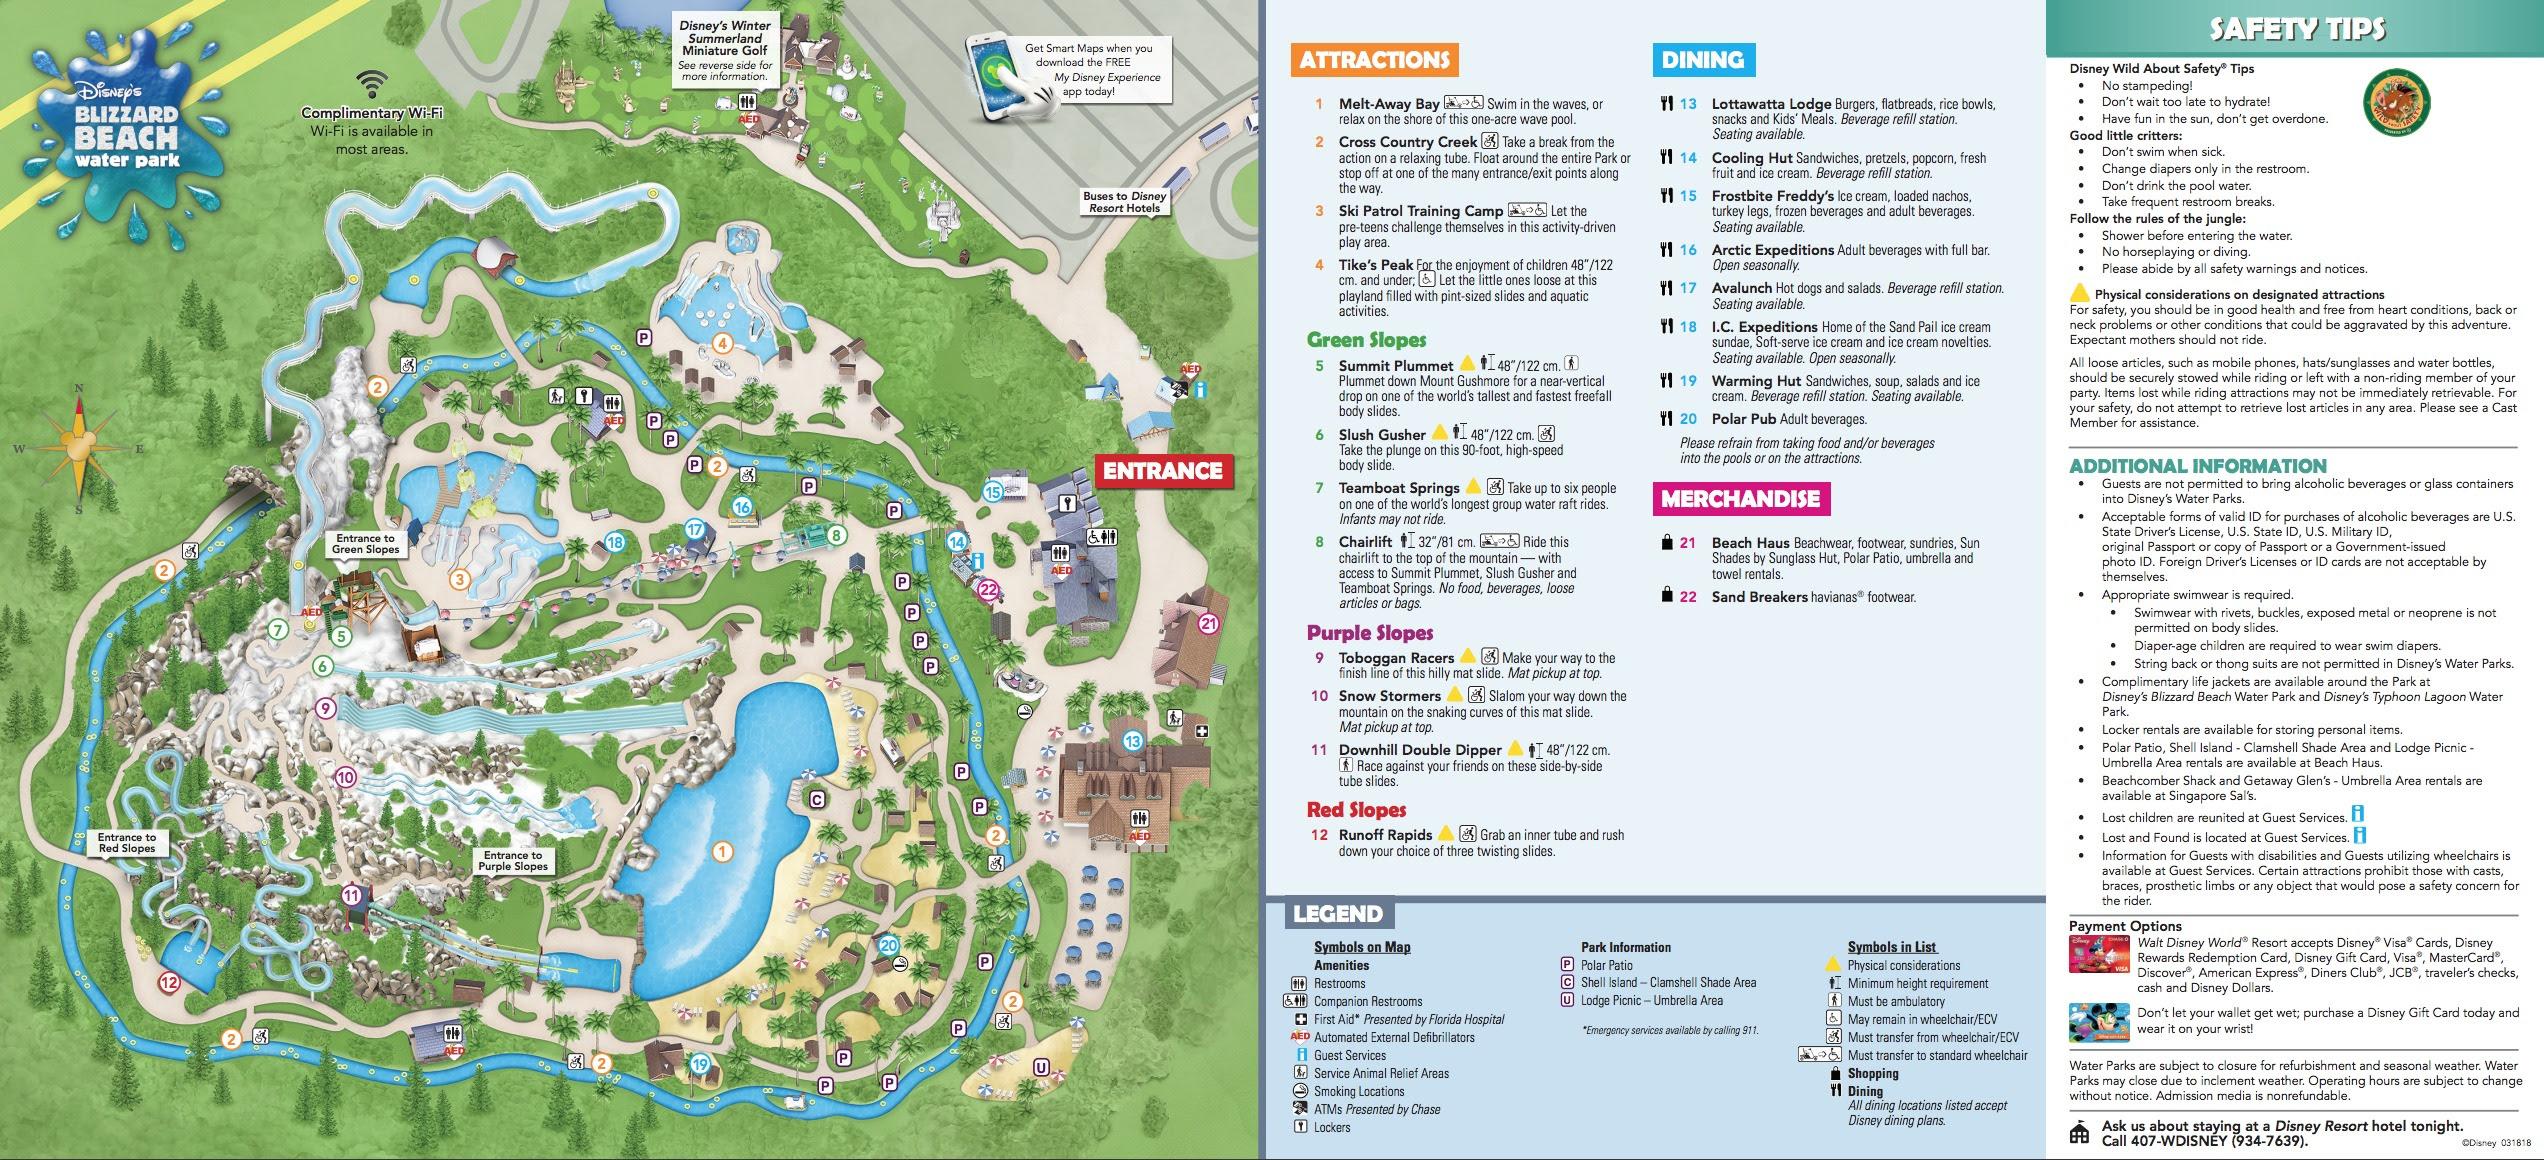 Disney's Blizzard Beach Water Park map